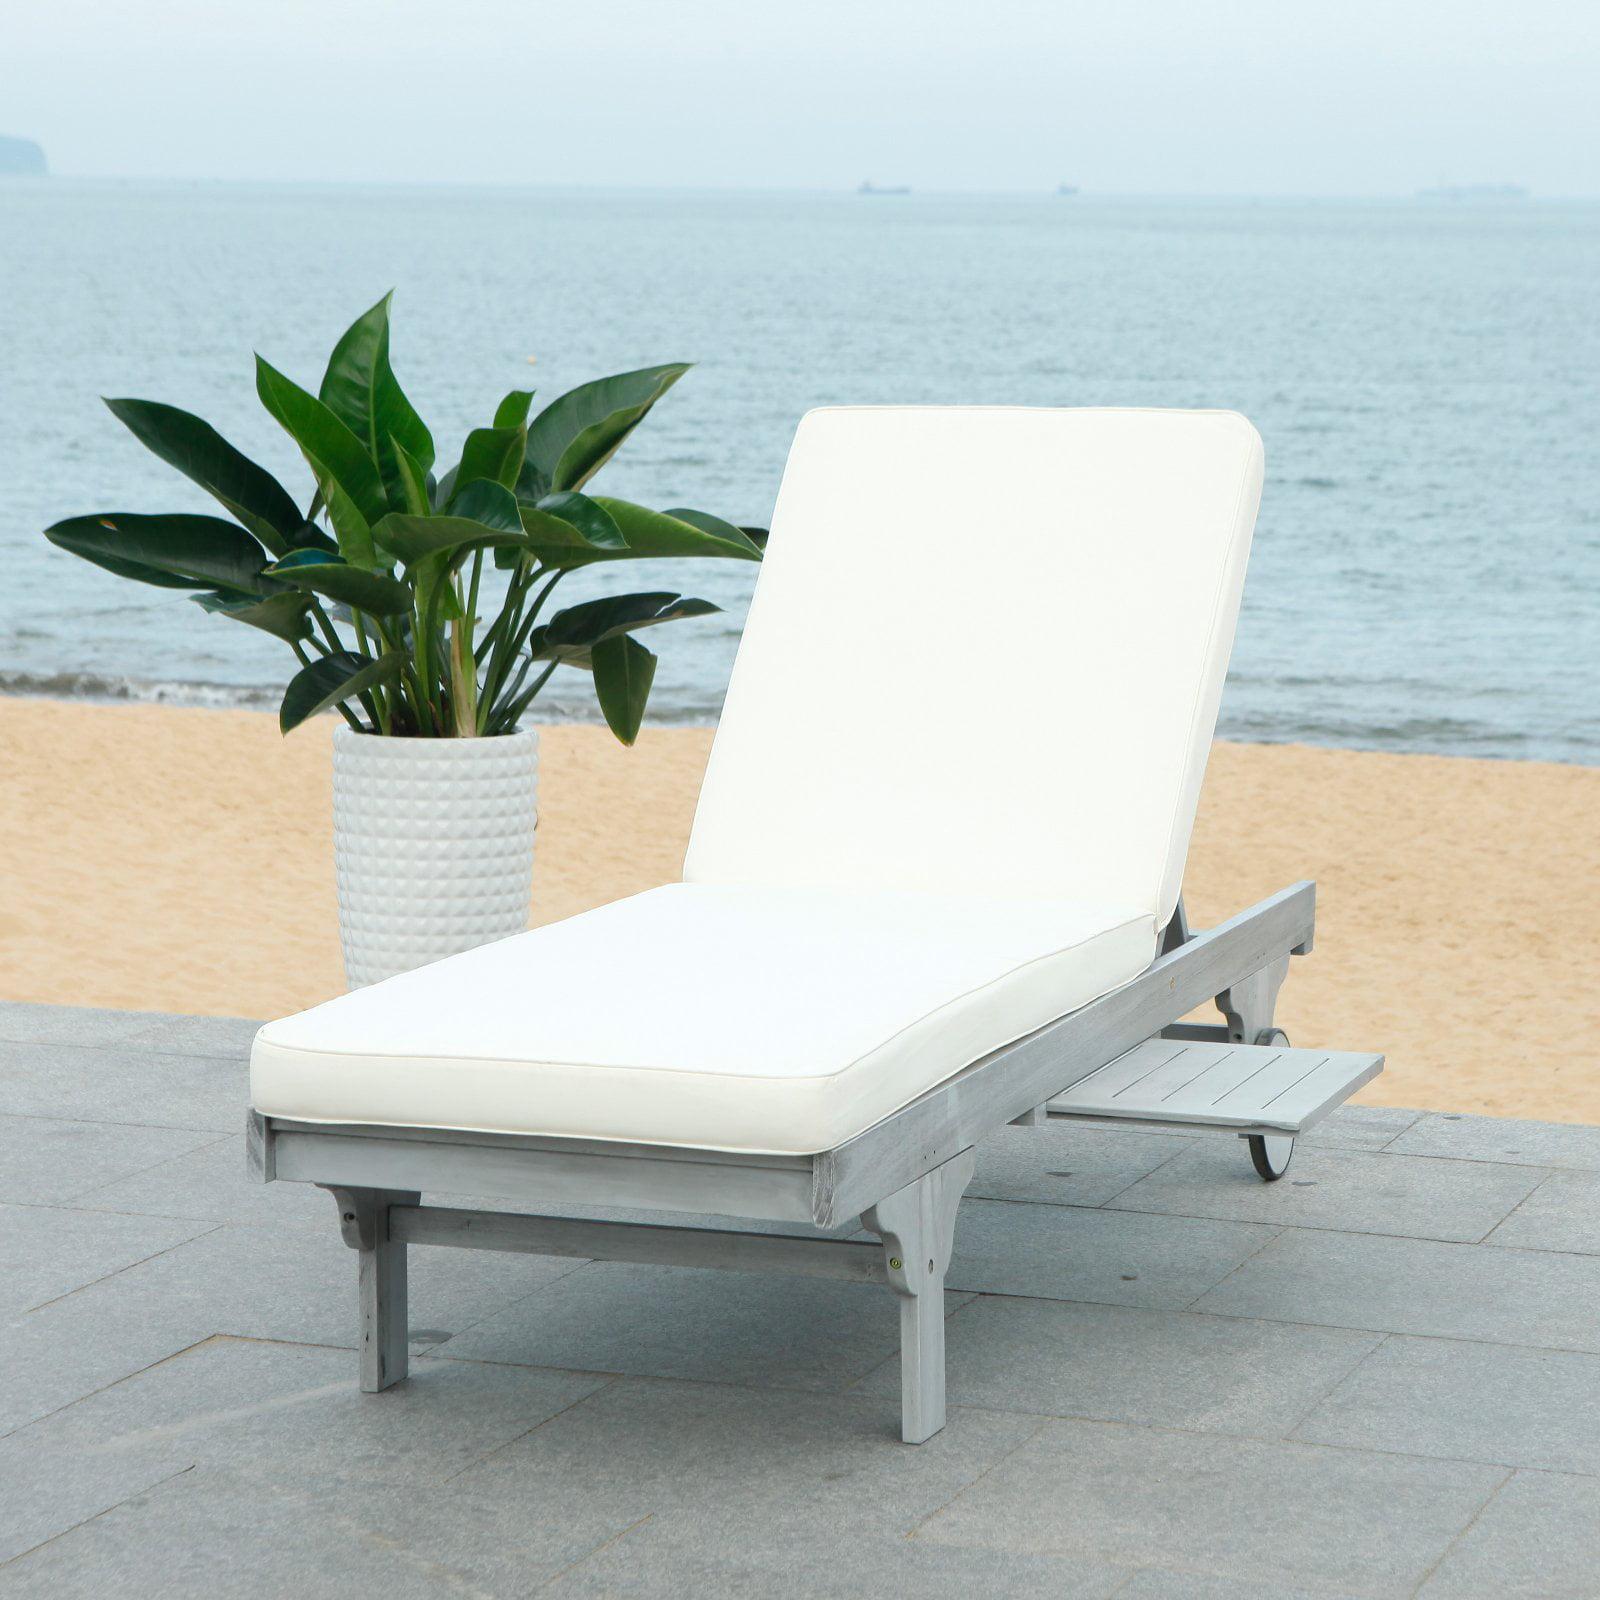 633d2bd2fdf Safavieh Newport Outdoor Modern Chaise Lounge Chair with Cushion -  Walmart.com